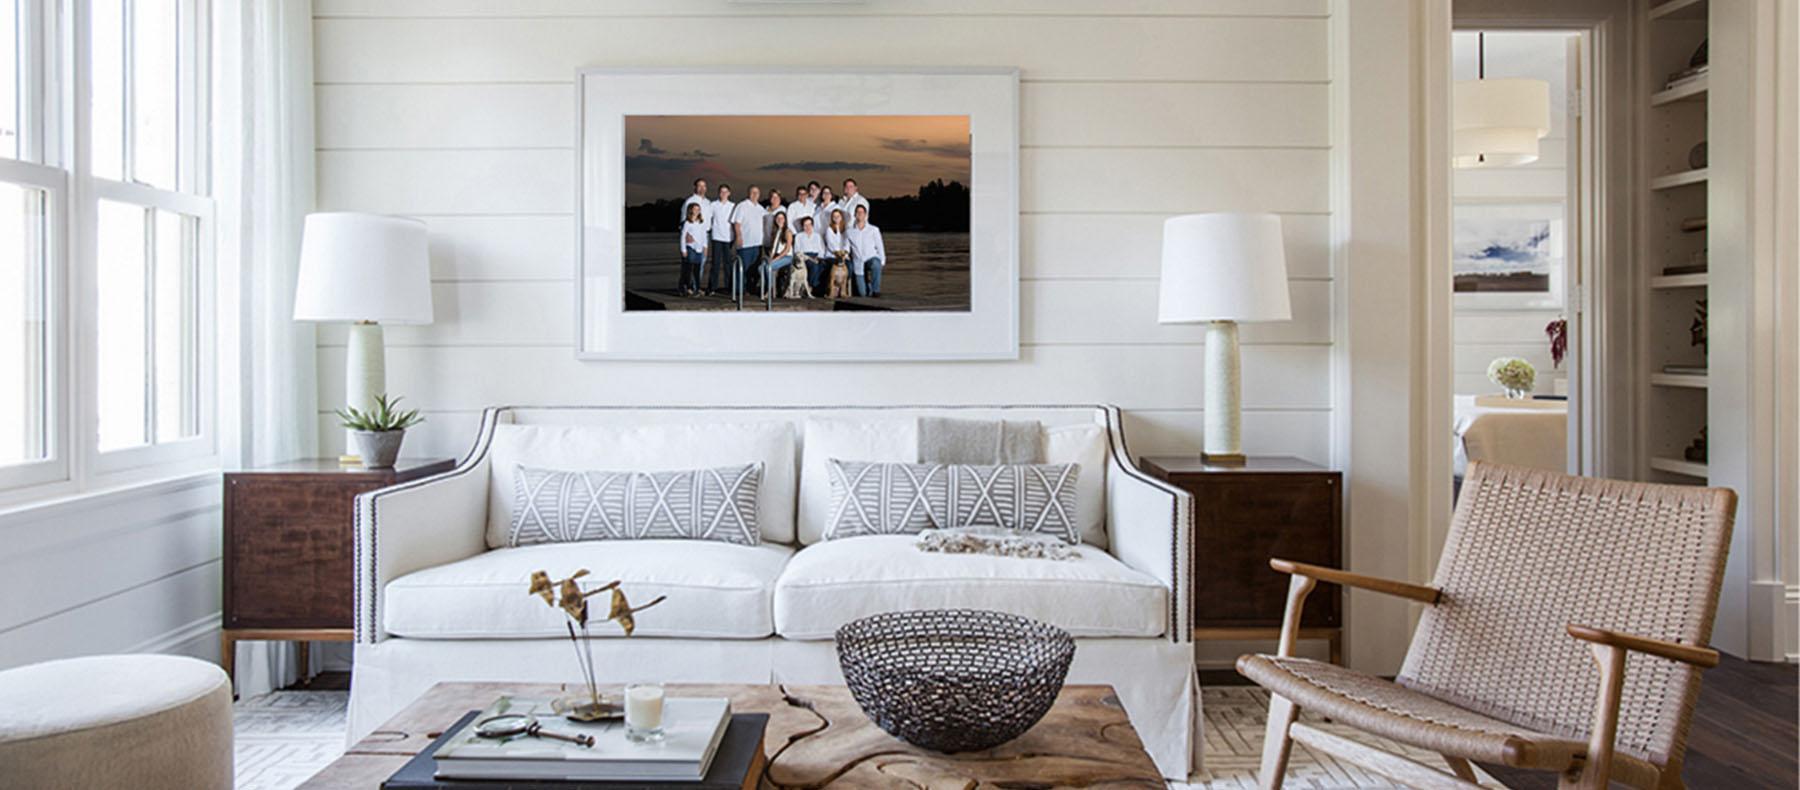 Multi-Generational-Environmental-Family-Portrait-at-the-lake-Cruz-Portrait-Design